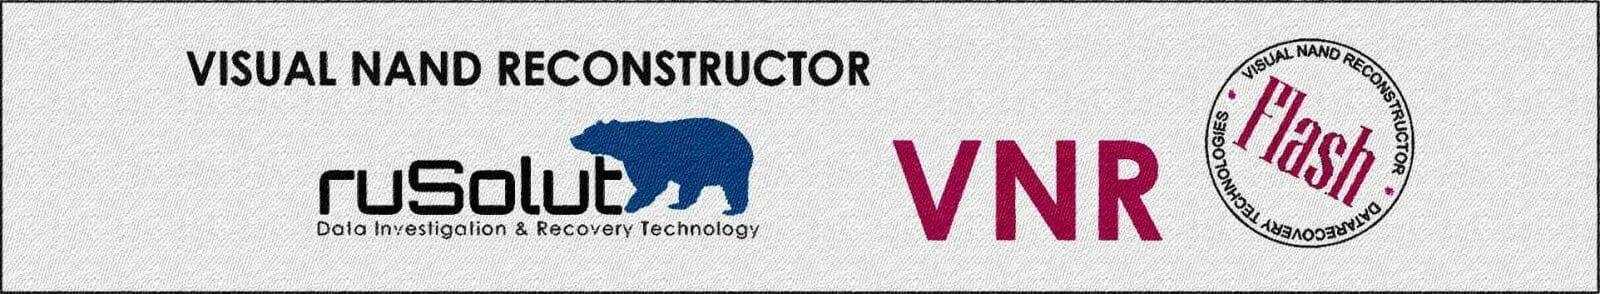 visual nand reconstructor Visual Nand Reconstructor VNR3 A